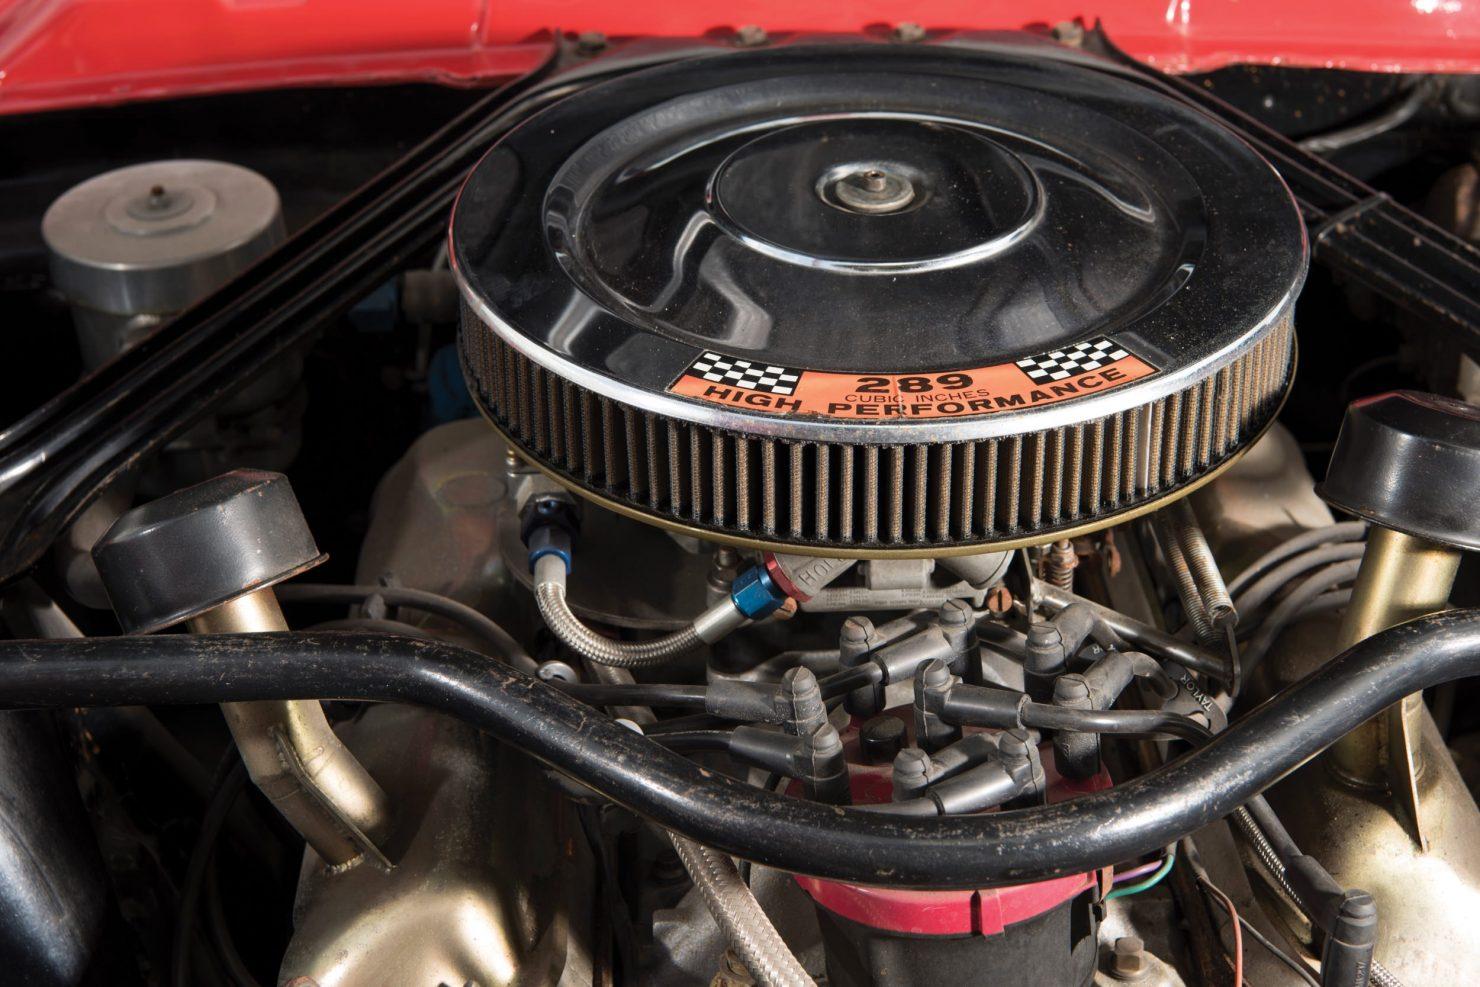 shelby gt350 race car 21 1480x987 - 1966 Shelby GT350 - Period SCCA Race Car